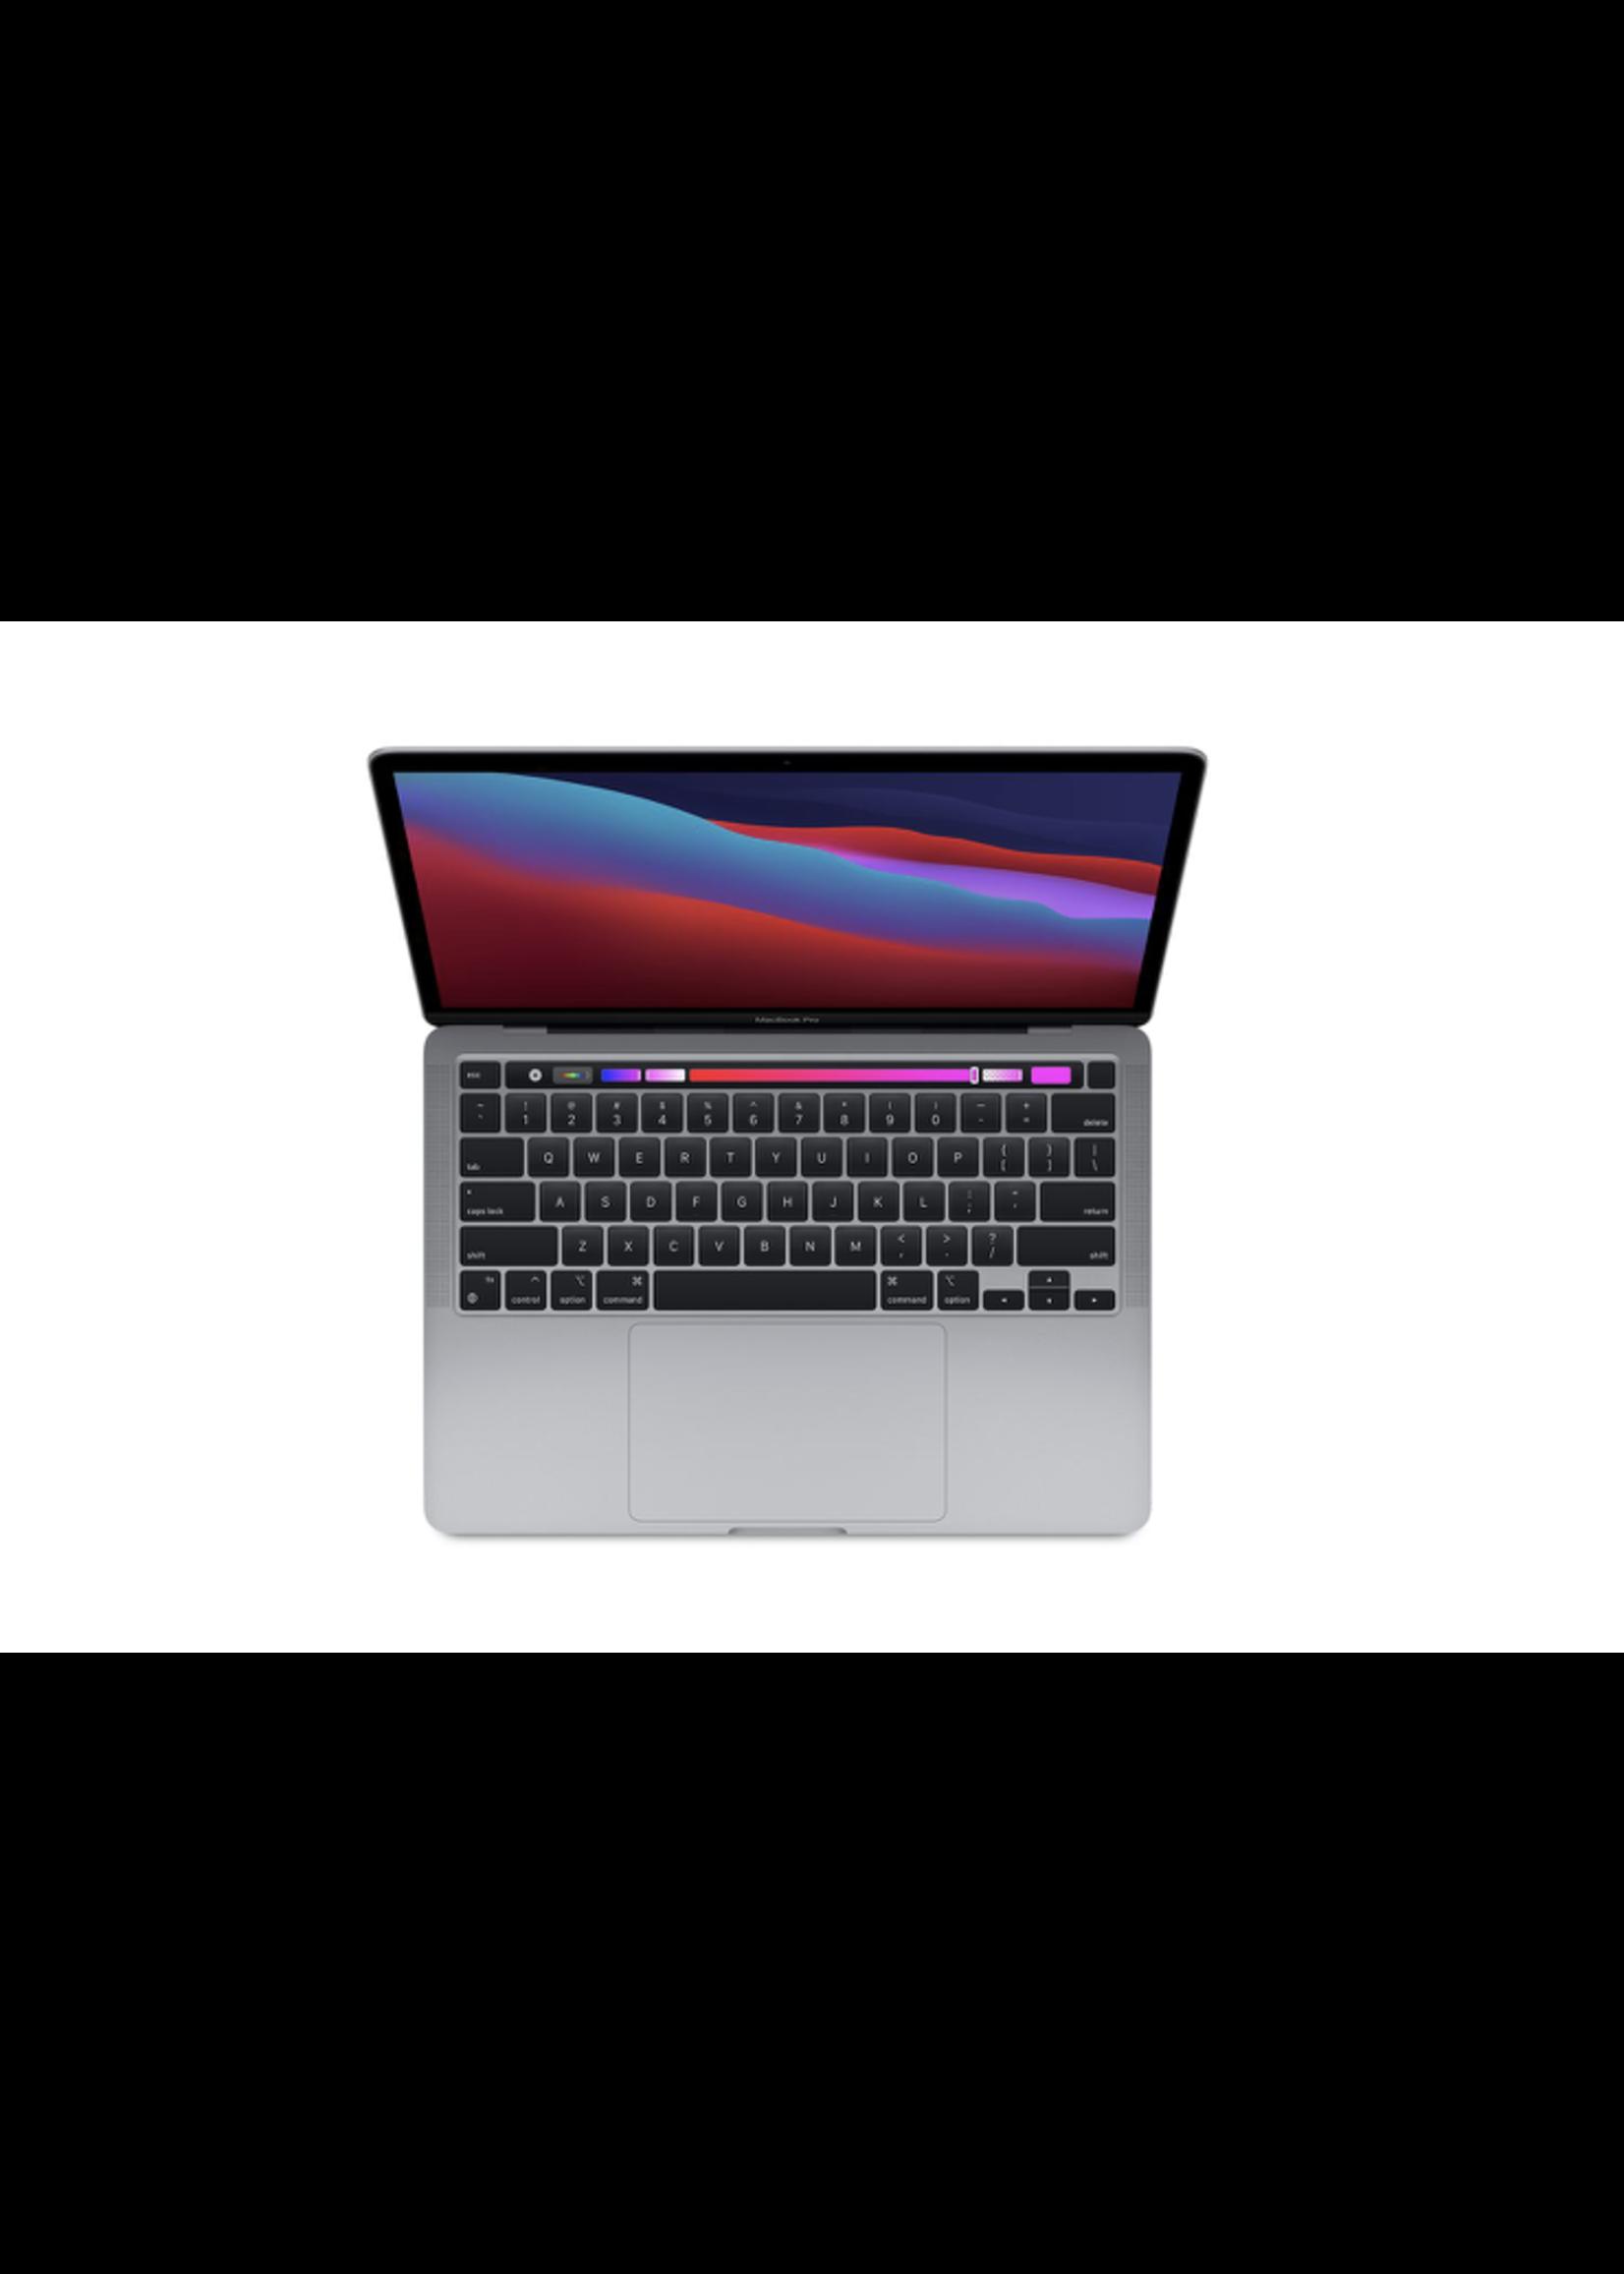 Apple MacBook Pro 13-inch 512GB Space Gray